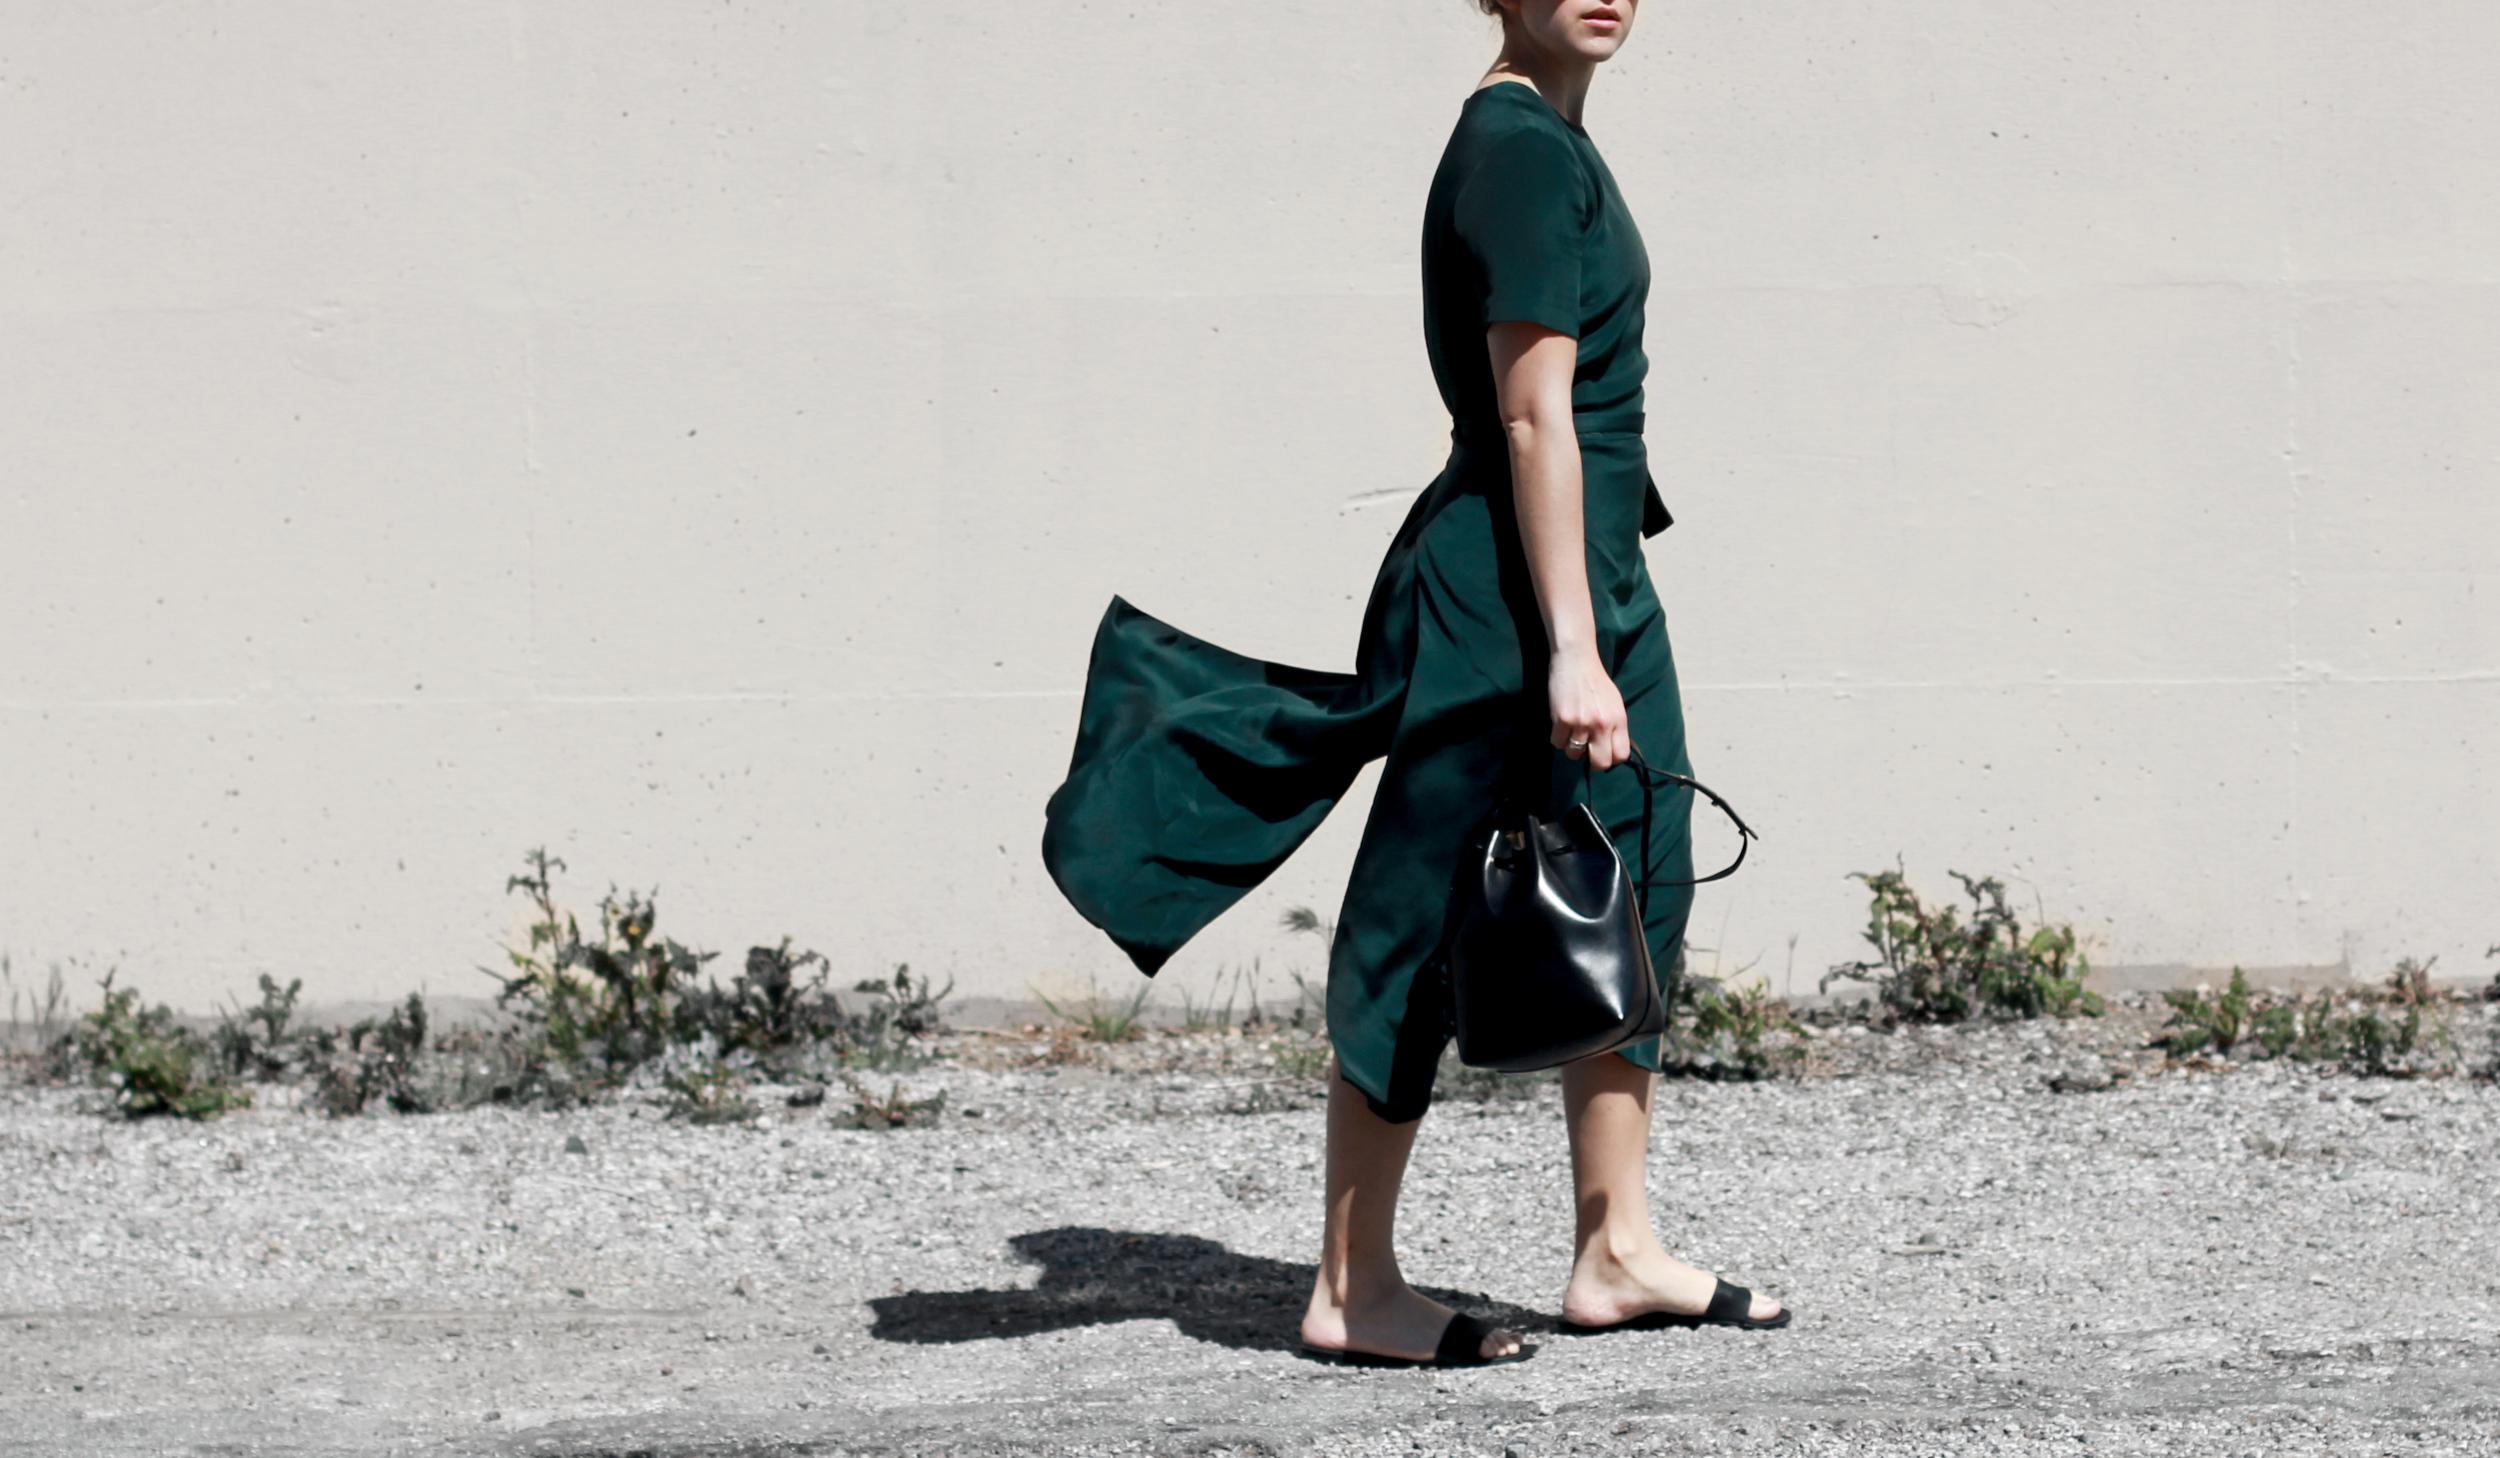 496-twelvoefour-1700-bucket-bag-summer-dress-IMG_7153.jpg